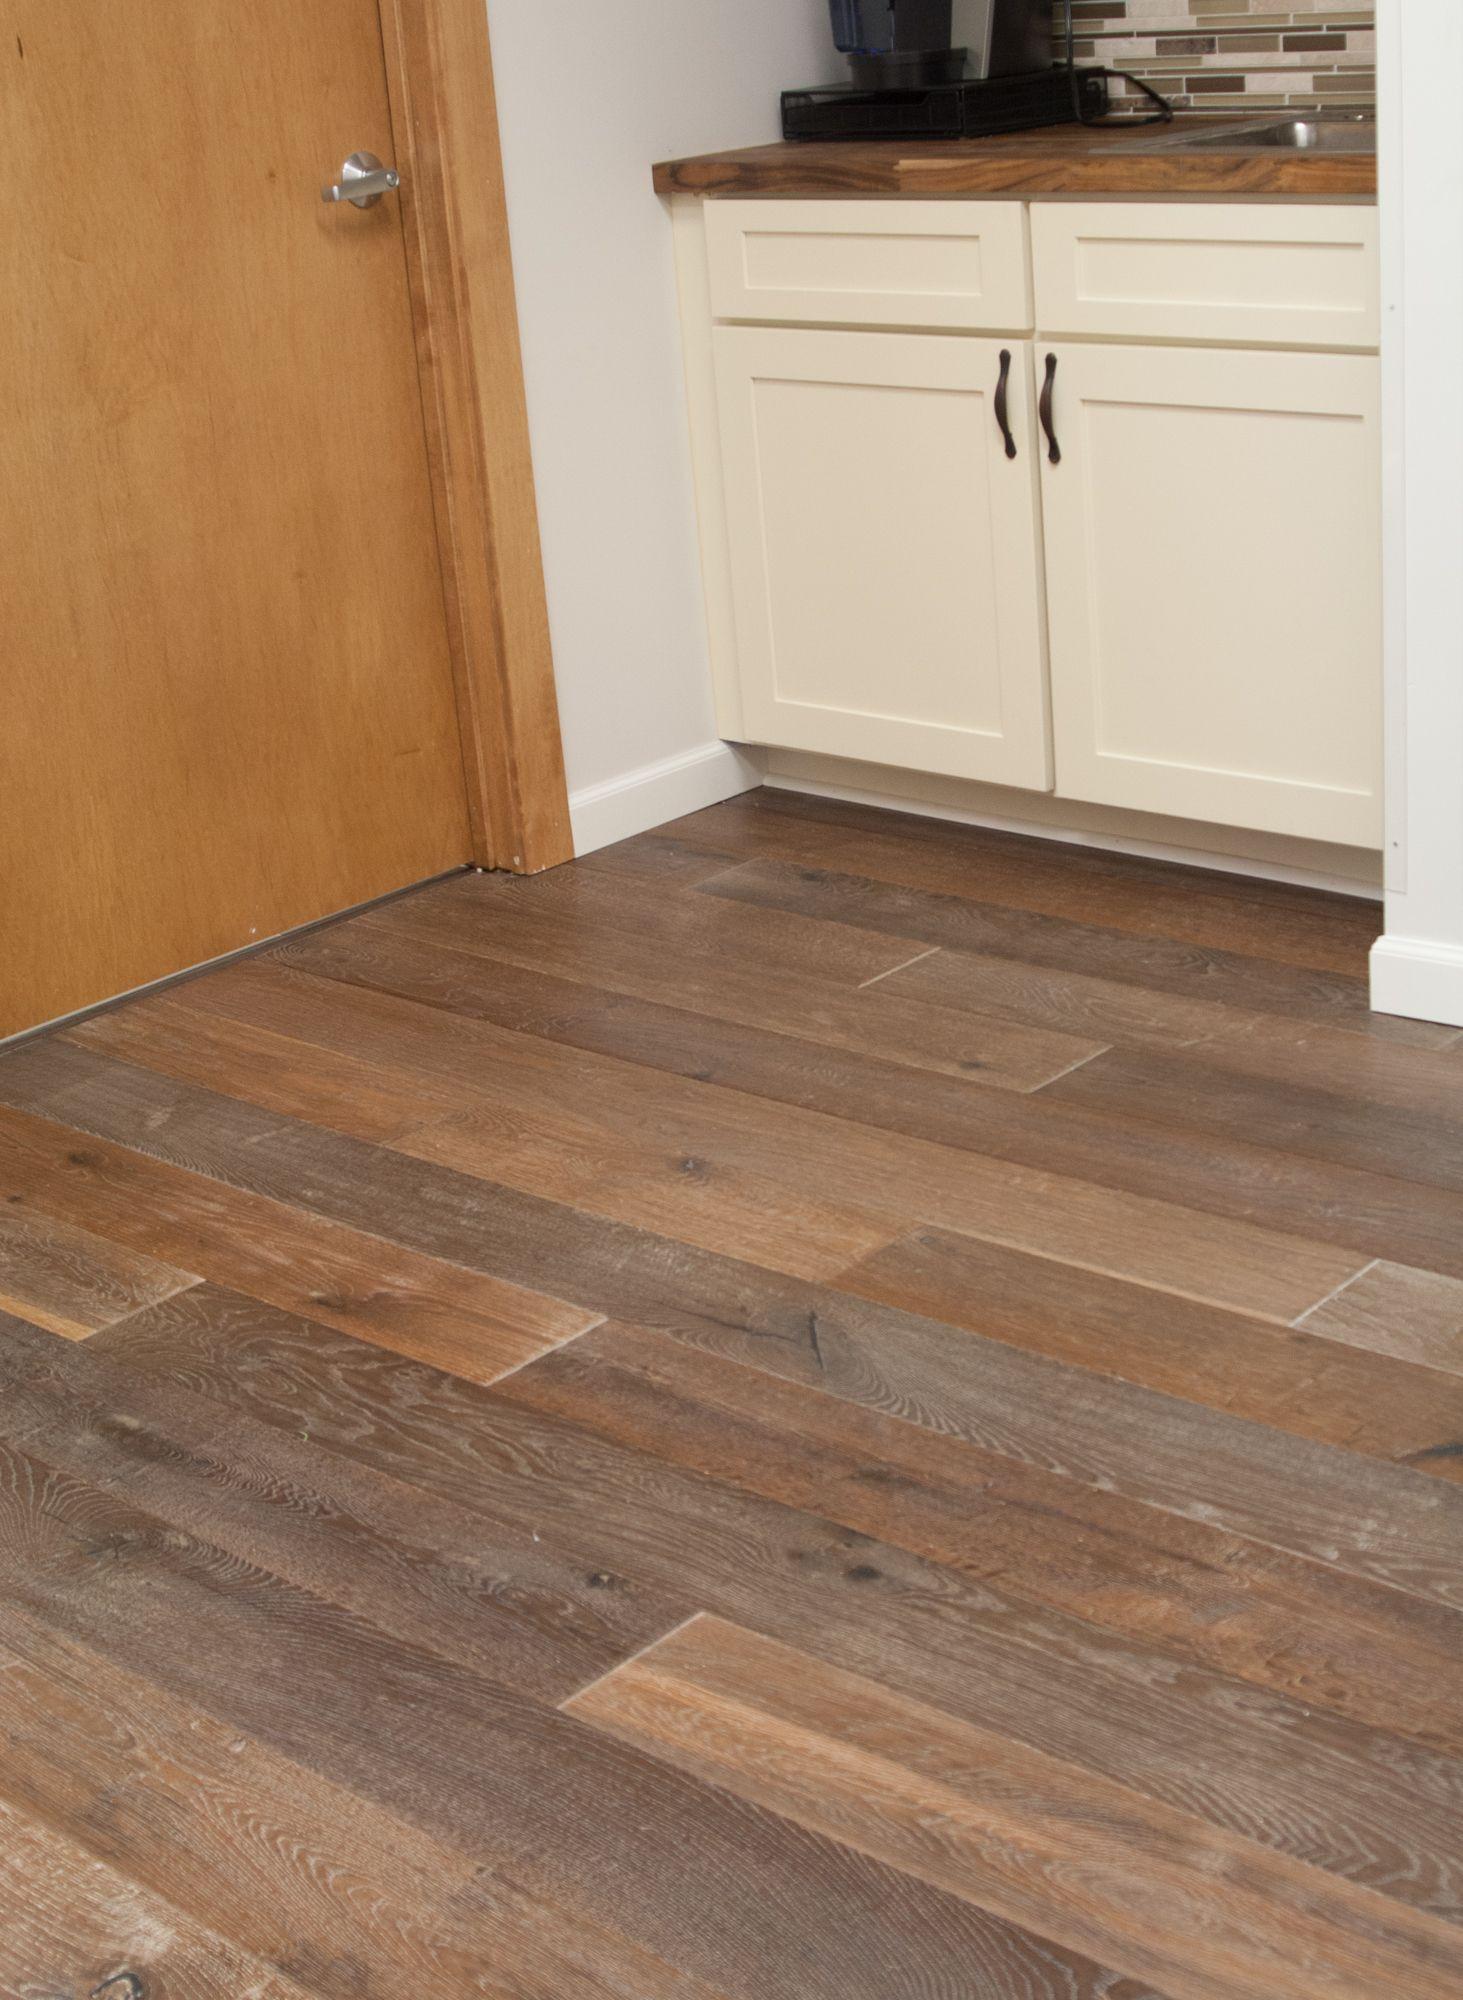 fsc hardwood flooring of flooring companies near me floor plan ideas within flooring companies near me vintage white oak costa hardwood floor home ideas